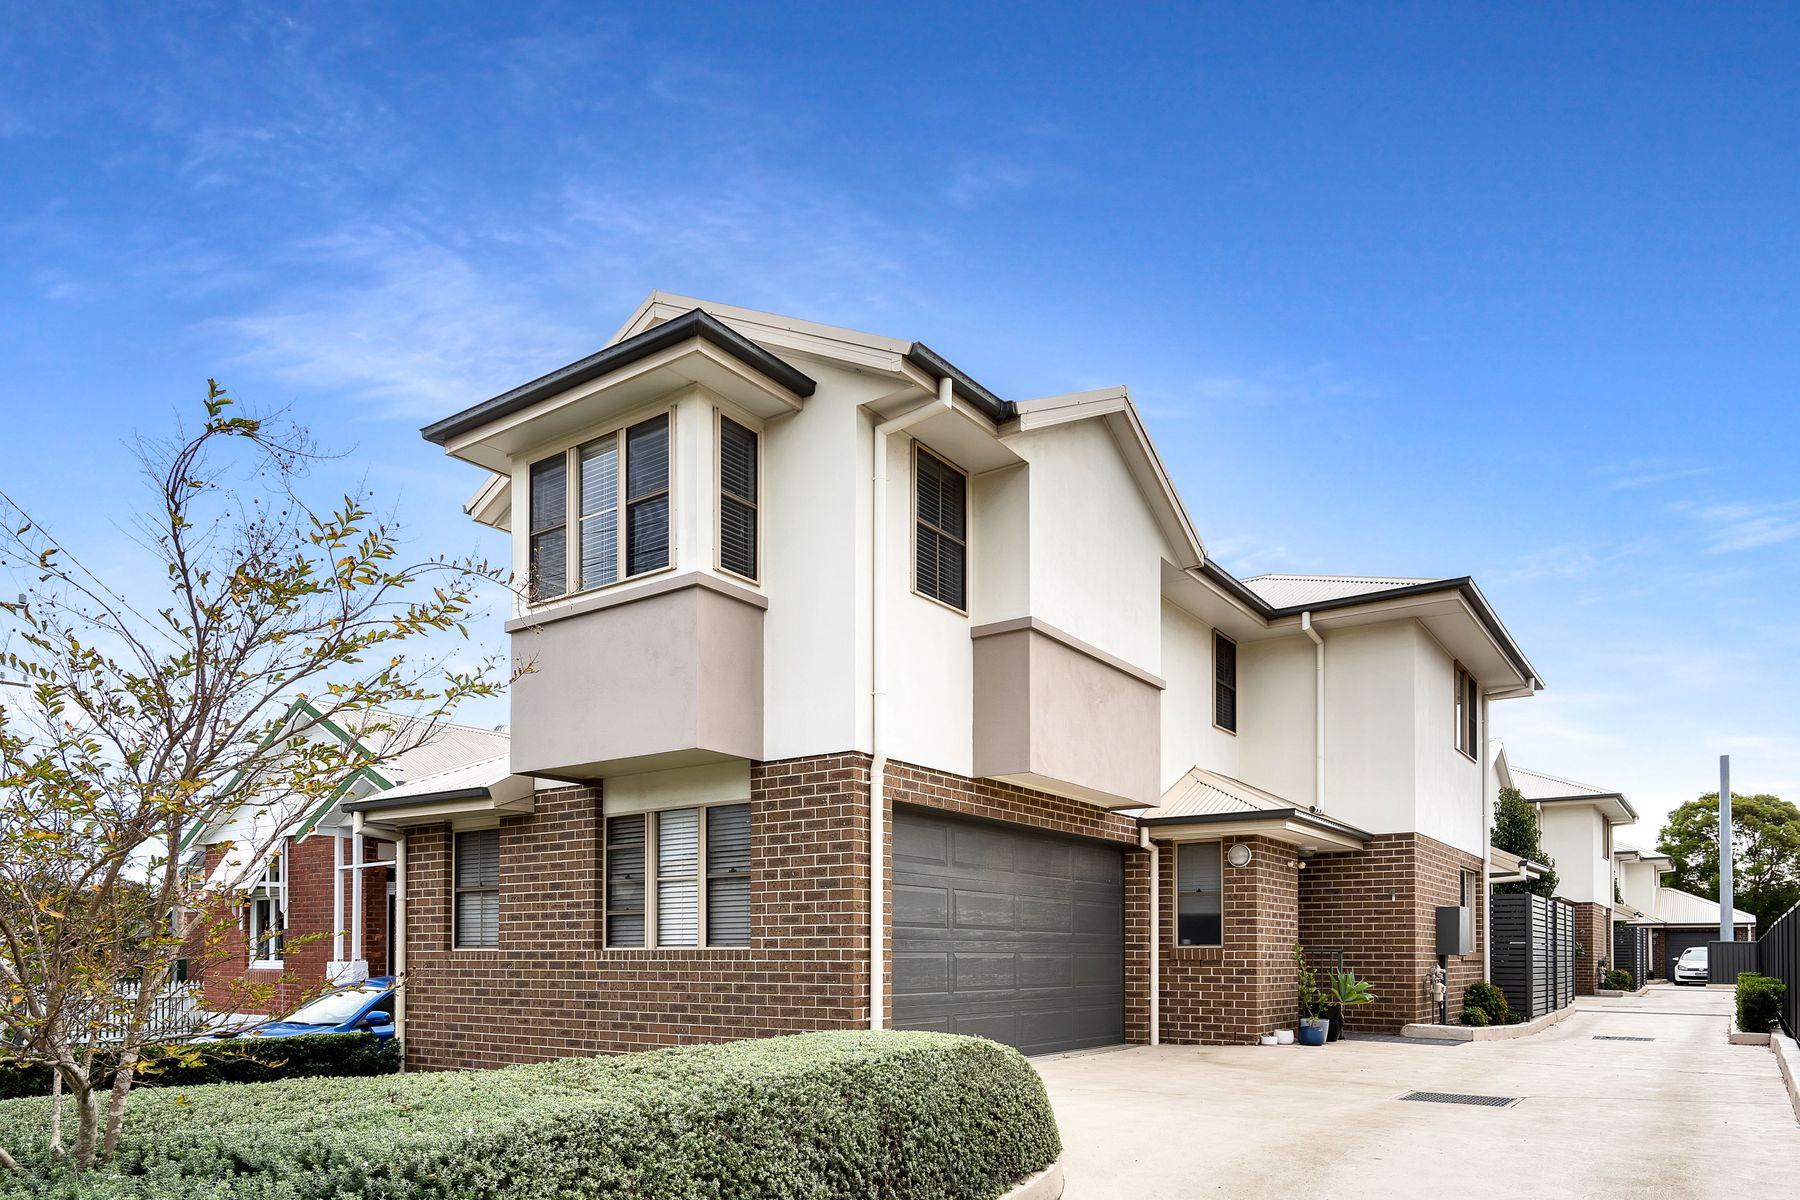 1/35. Hobart Road, New Lambton, NSW 2305